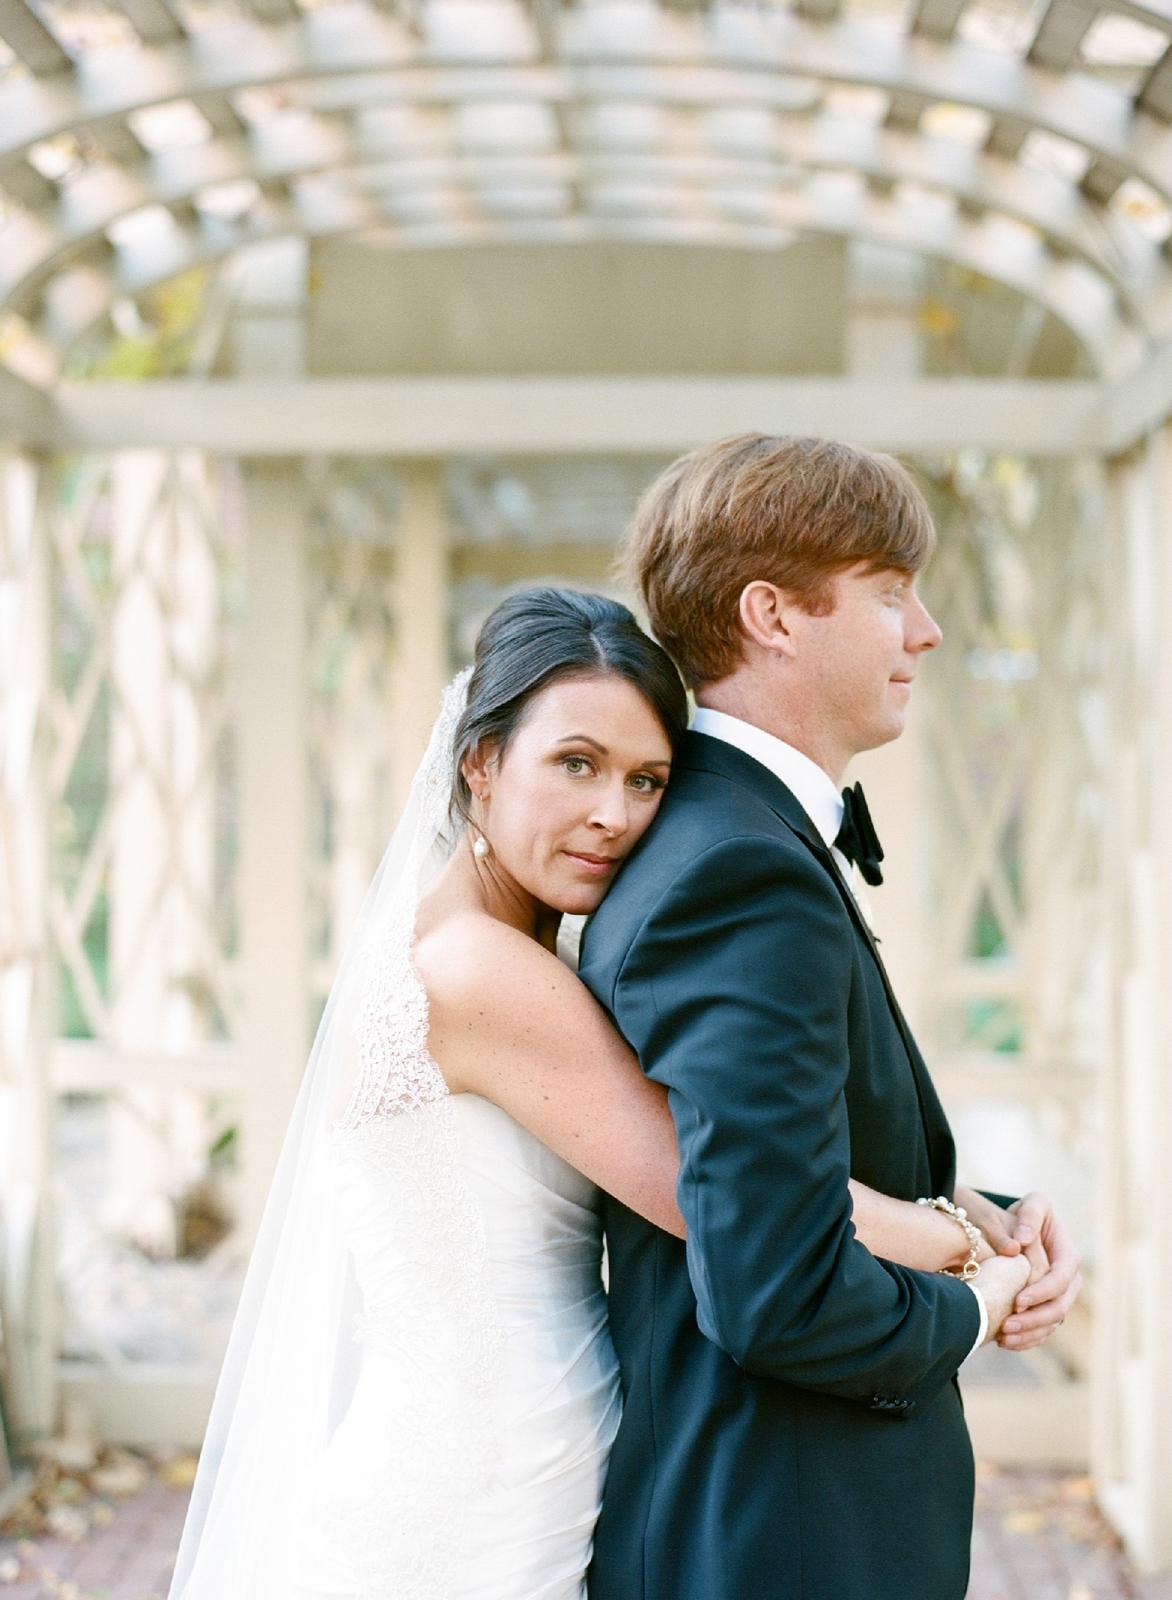 atrium at curtis center wedding photographer philadelphia wedding photographer shannon griffin_0079.jpg